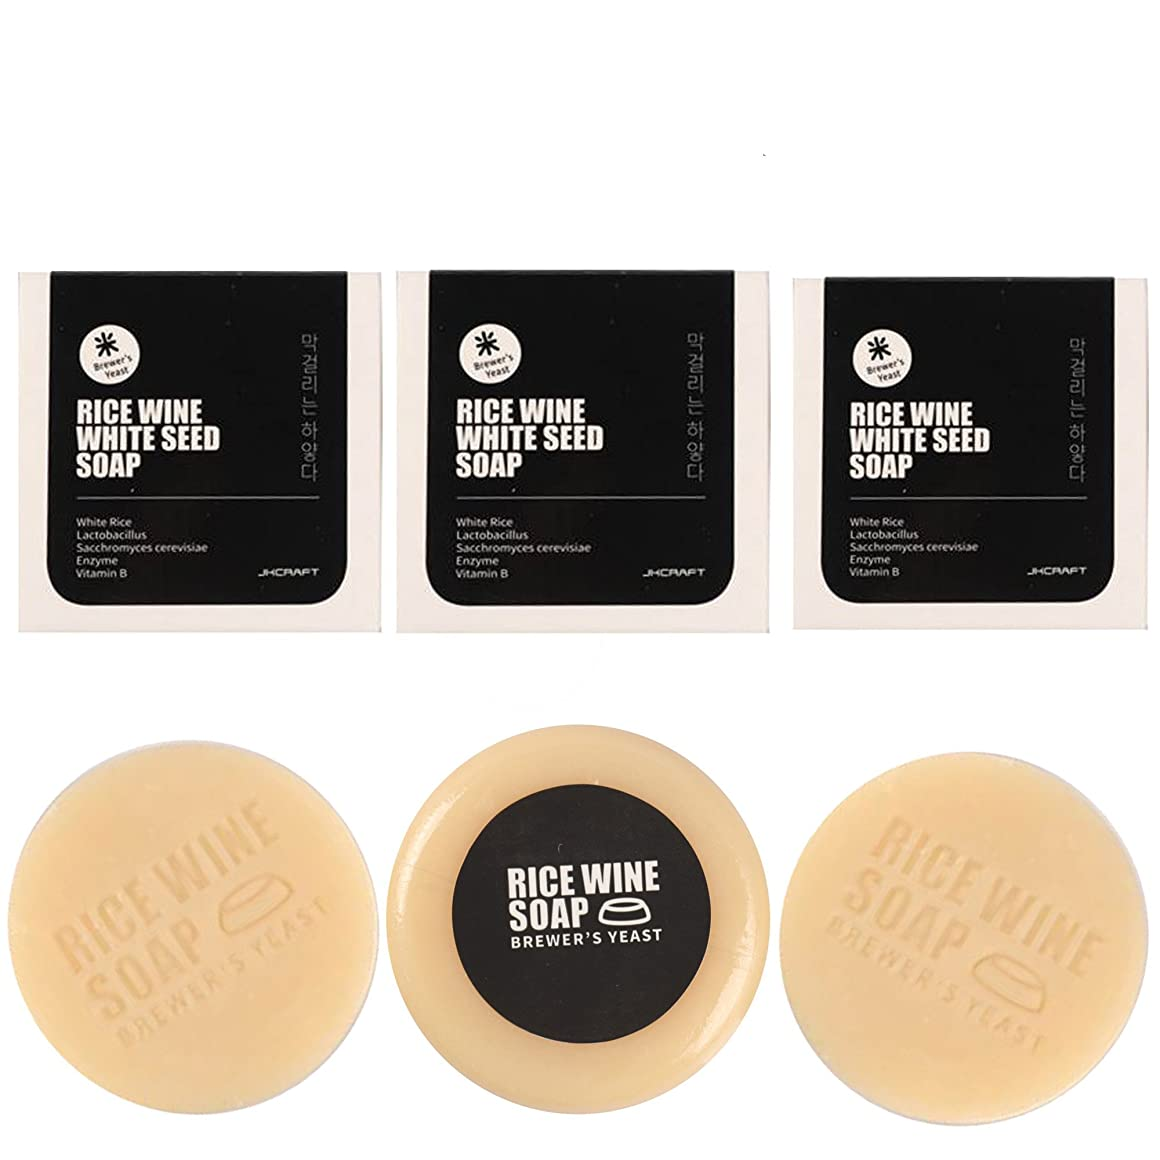 JKCRAFT RICEWINE WHITE SEED SOAP マッコリ酵母石鹸 3pcs [並行輸入品]マッコリ酵母石鹸,無添加,無刺激,天然洗顔石鹸